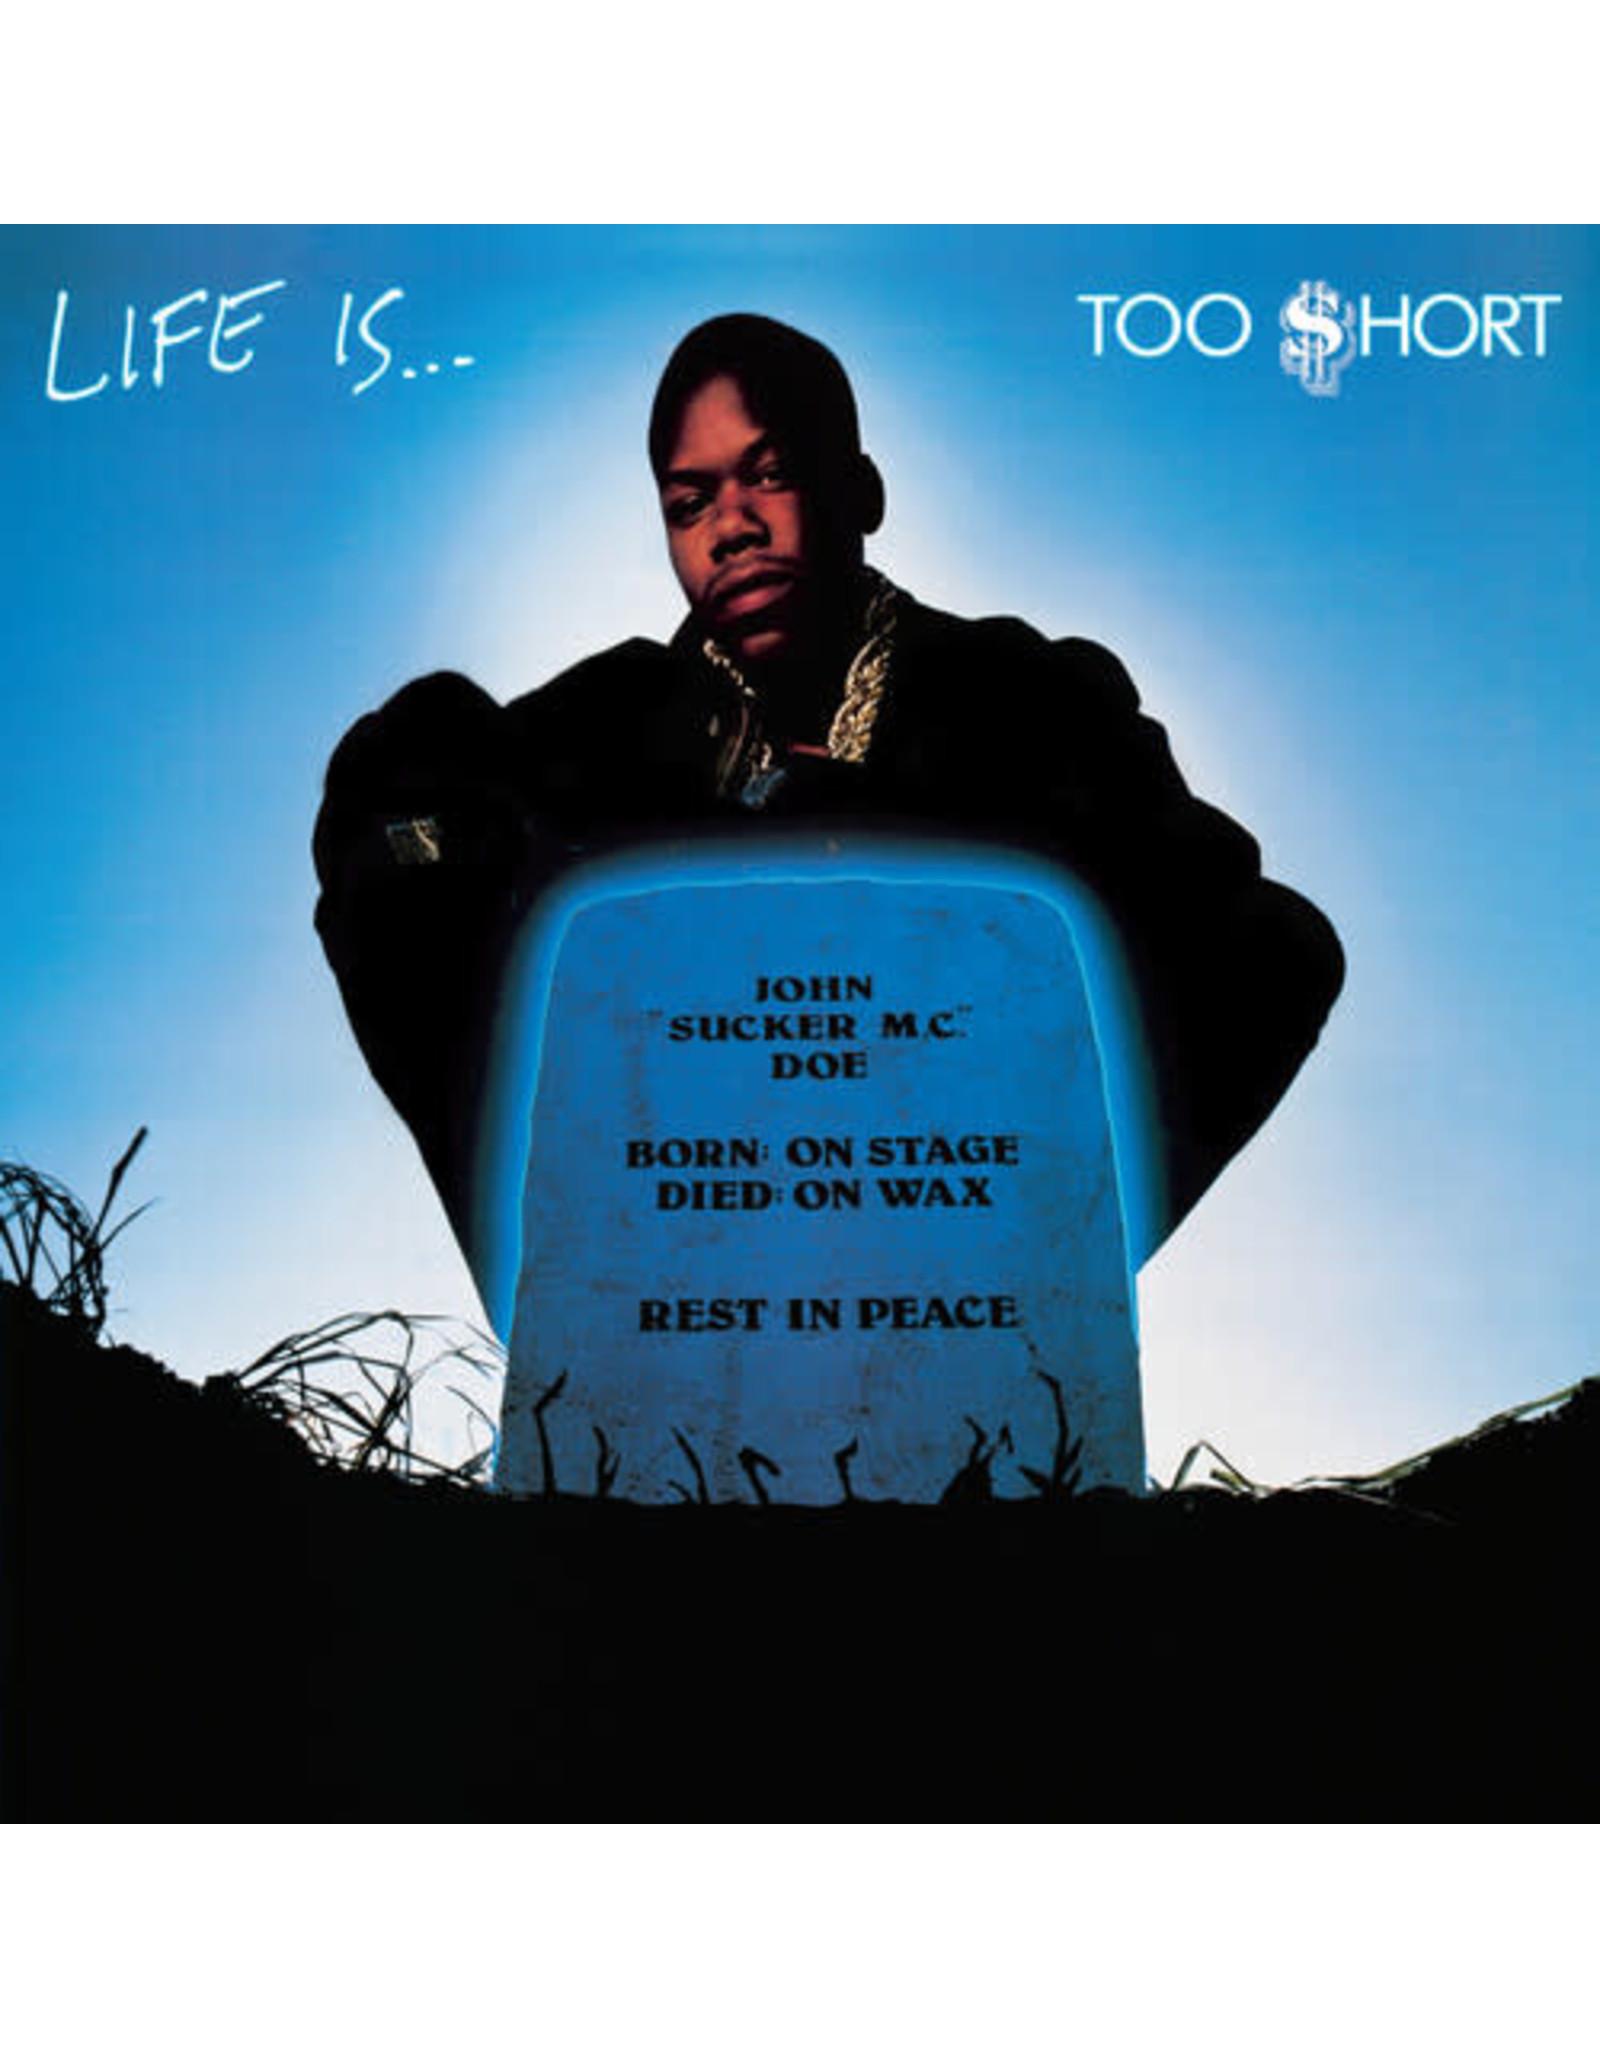 New Vinyl Too $hort - Life Is...Too $hort LP